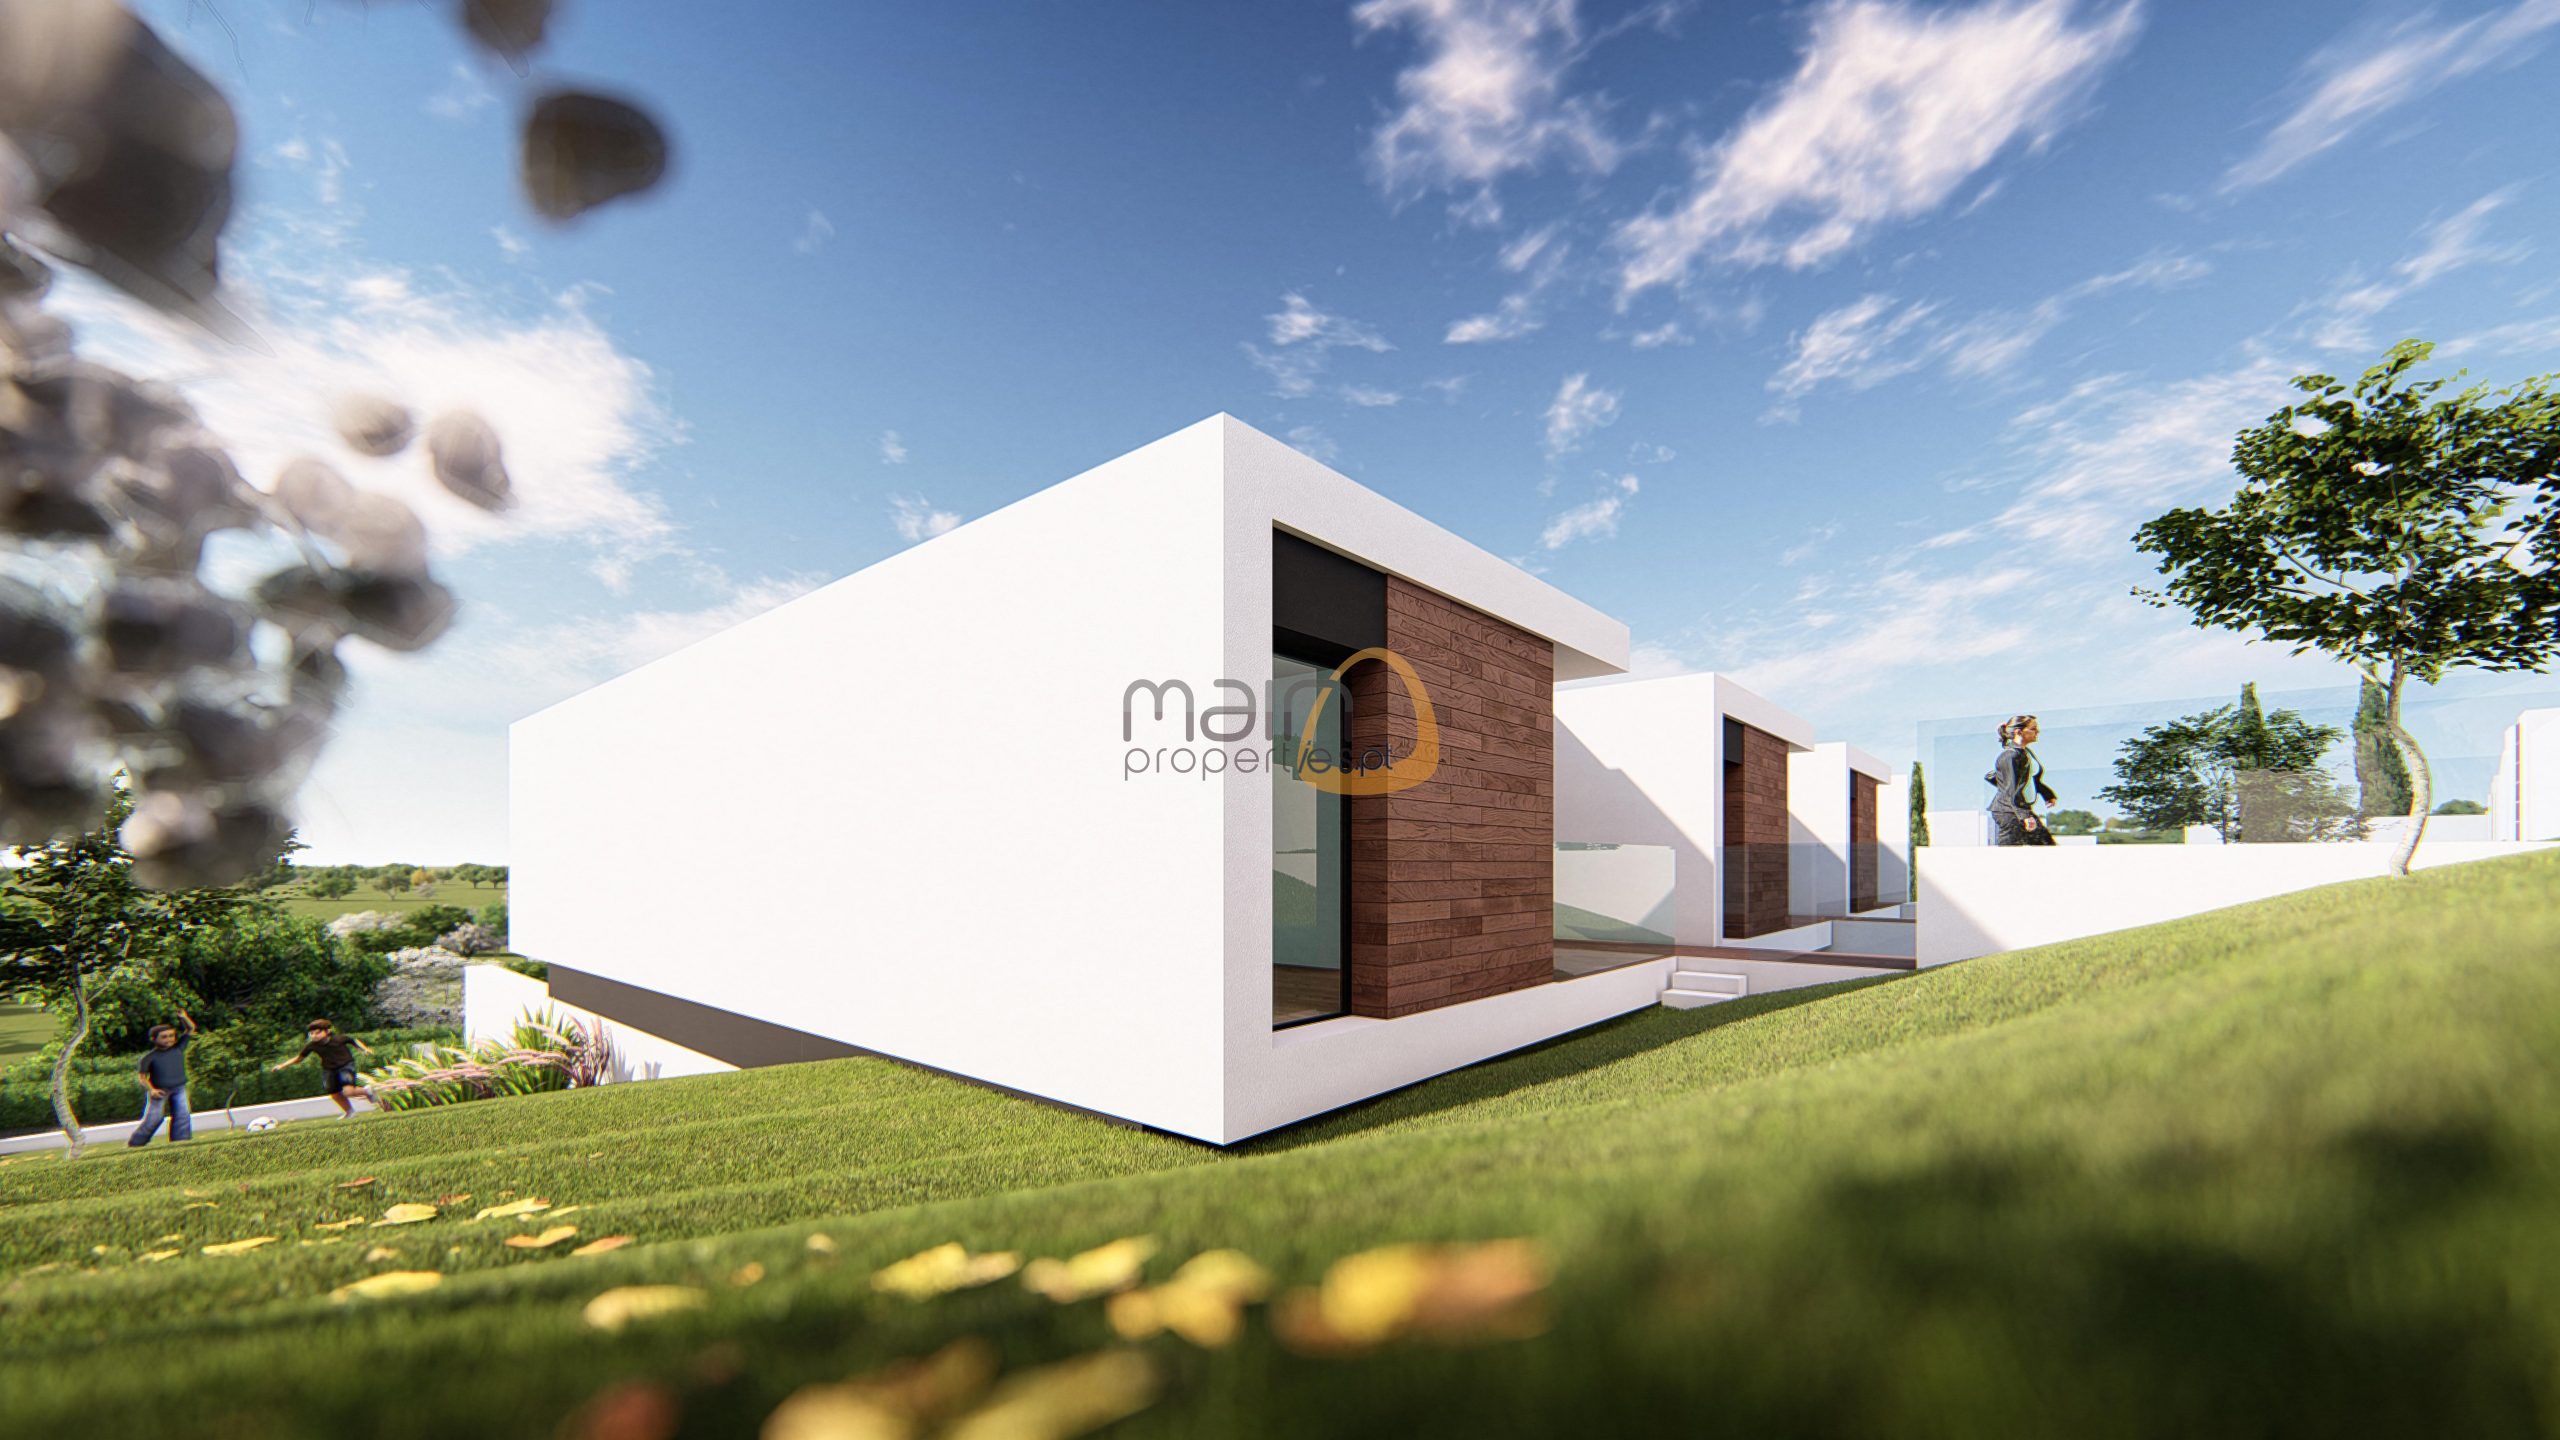 land-for-development-of-eleven-villas-with-sea-views-in-almancil-algarve-portugal-property-real-estate-02